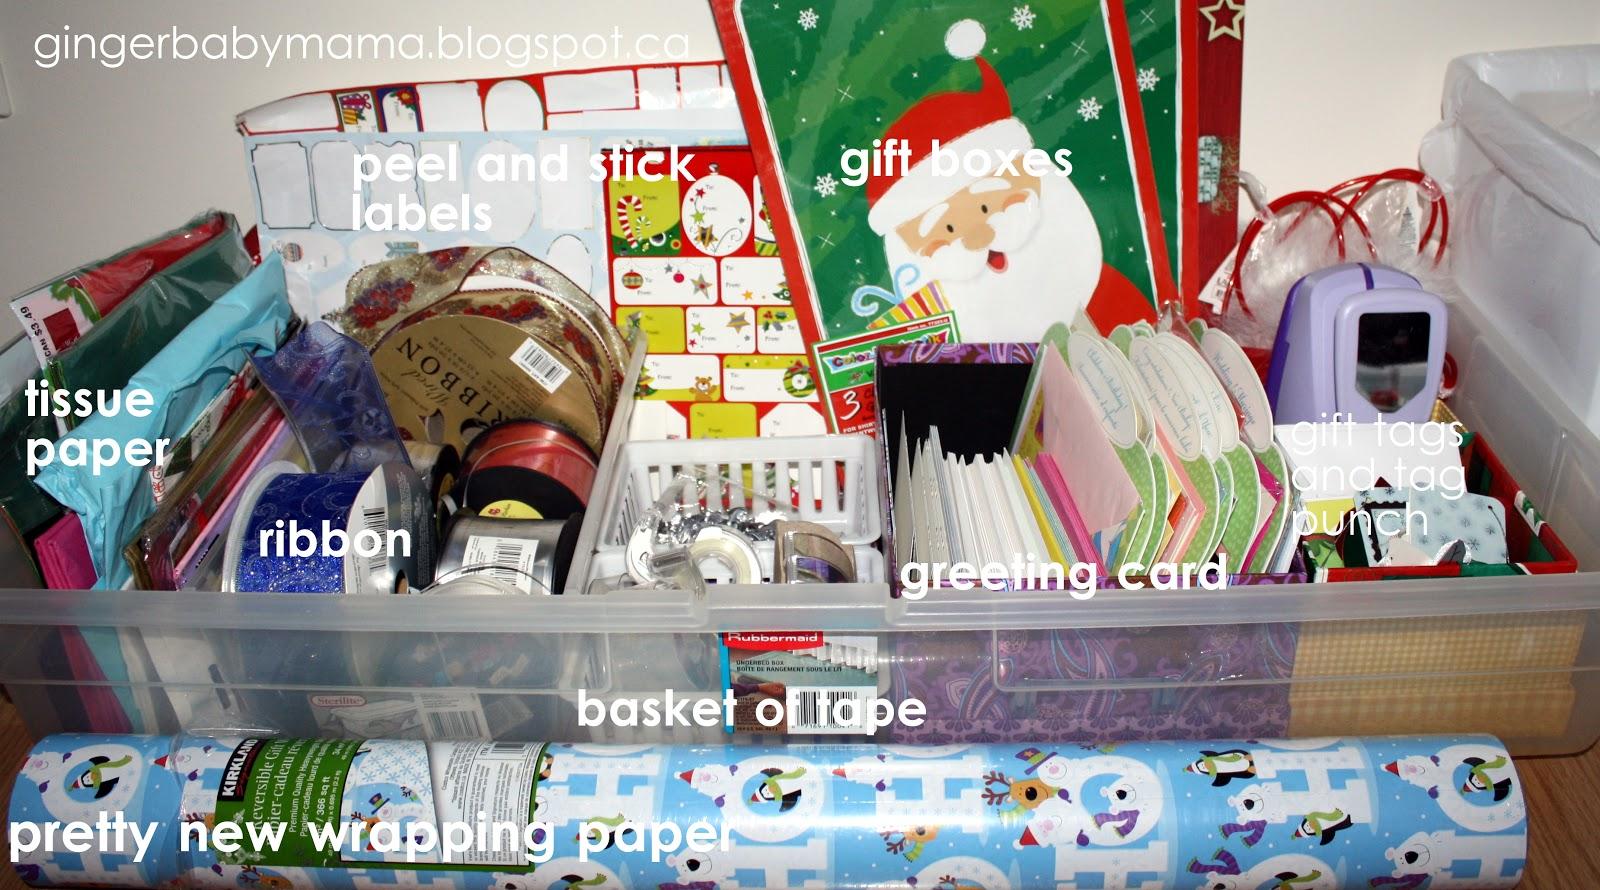 GingerBabyMamaGift Wrap Storage and Organization